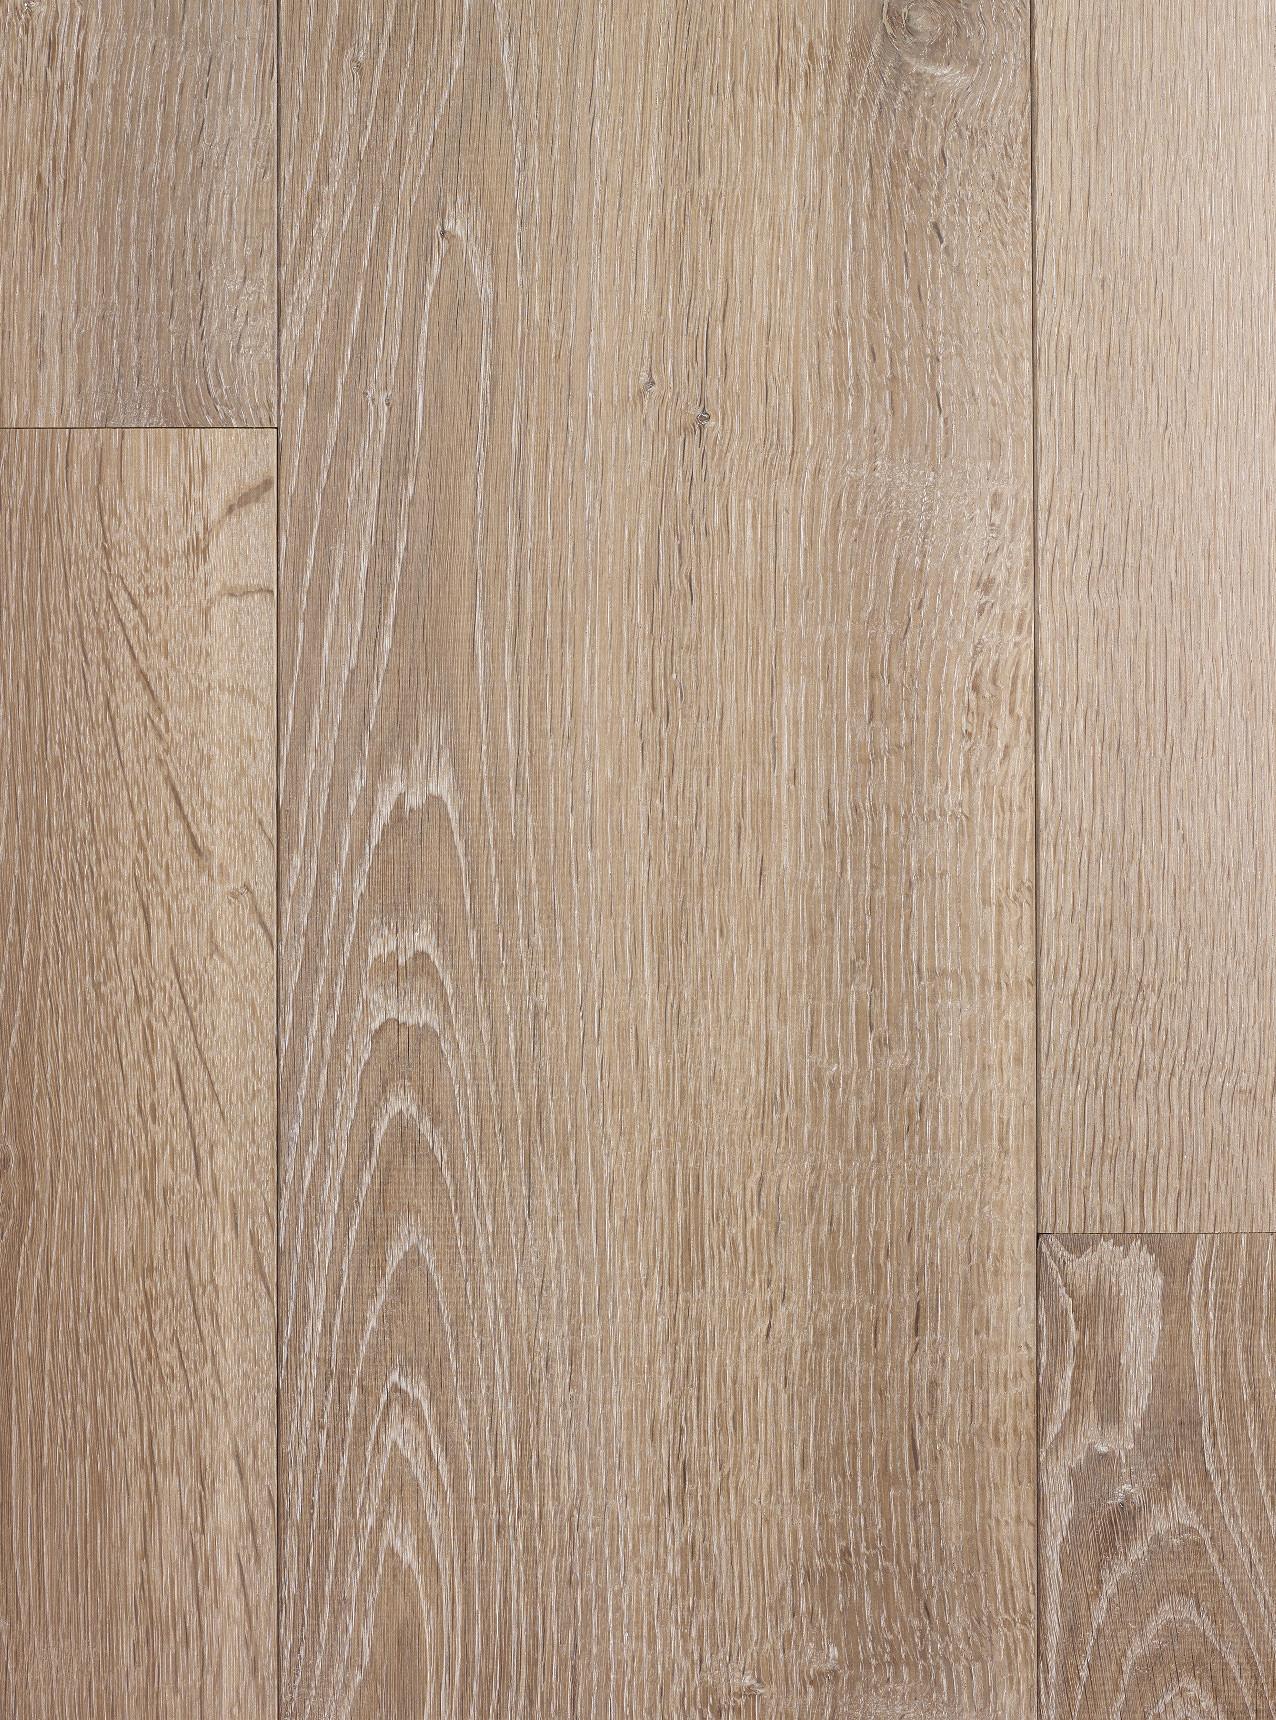 Oak landmark dyrham plank